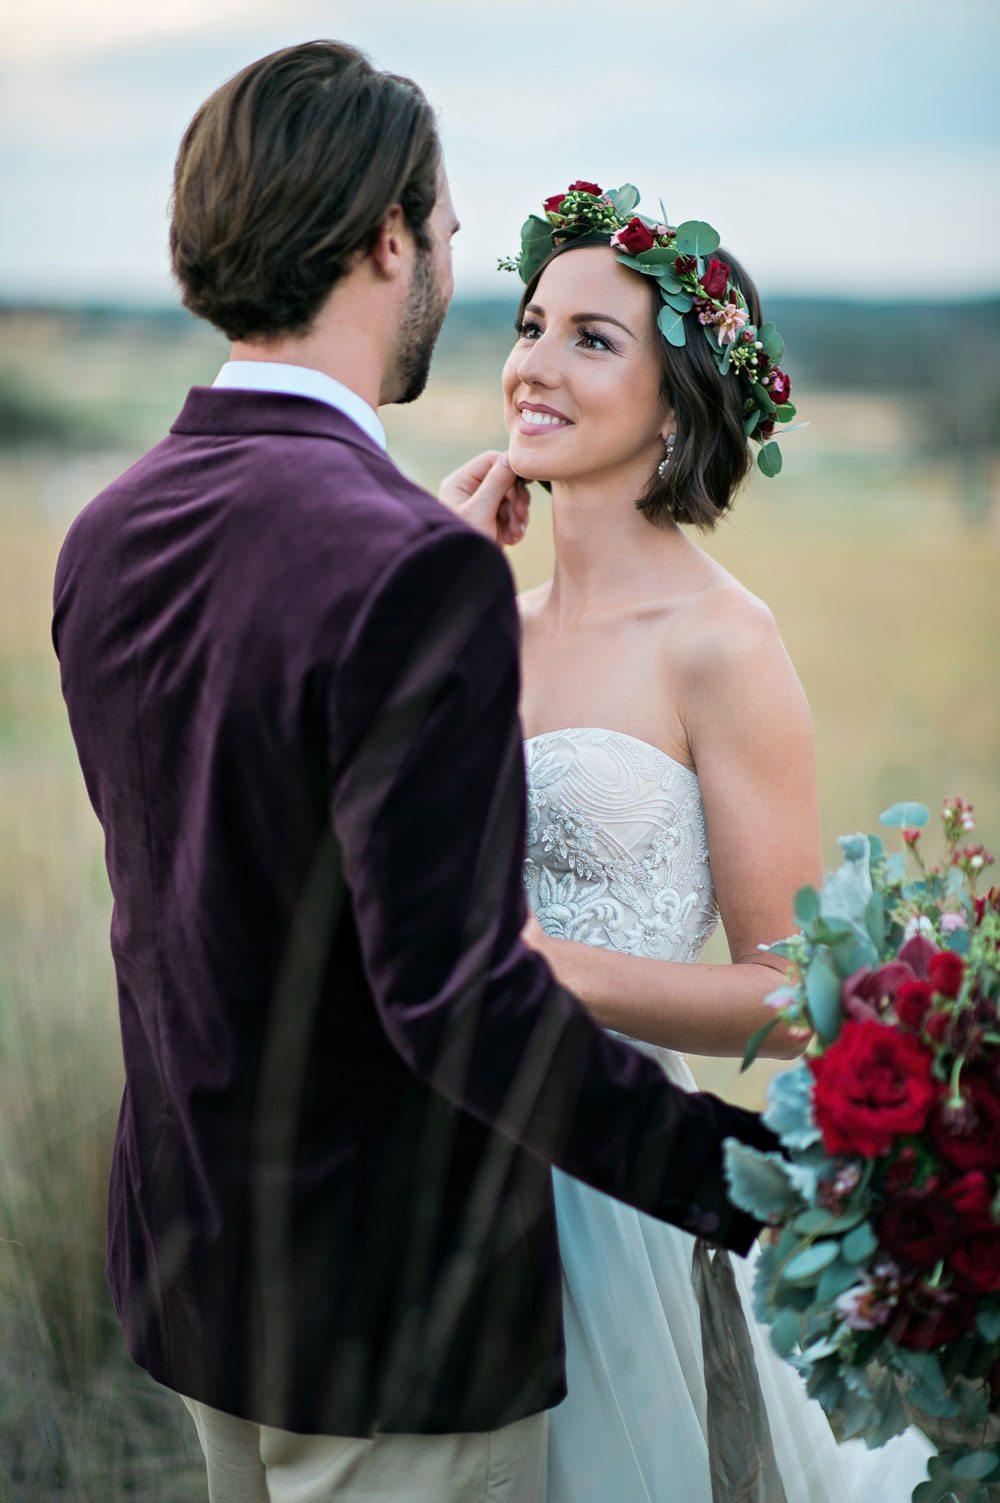 bride with flower crown and groom with maroon velvet jacket